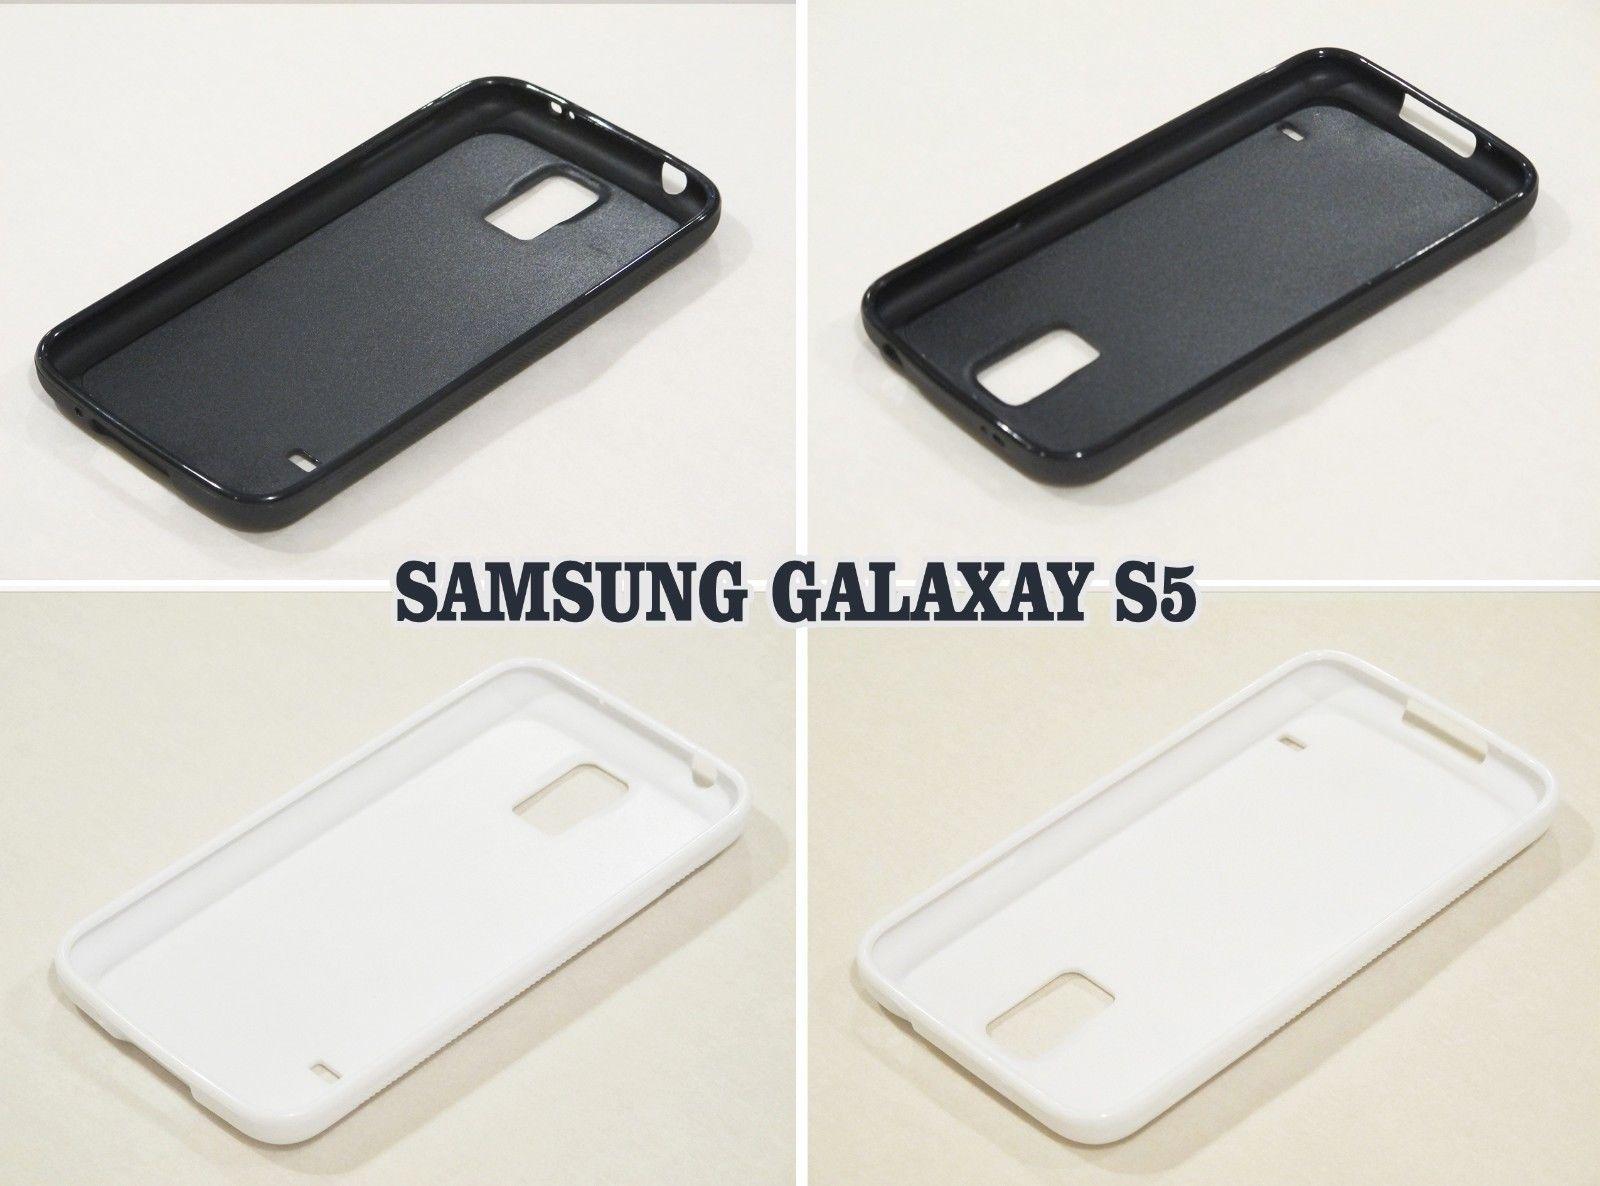 TEAL TRELLIS CUSTOM IMAGE PHOTO MONOGRAM CASE For Samsung Galaxy S7 S6 NOTE 5 4